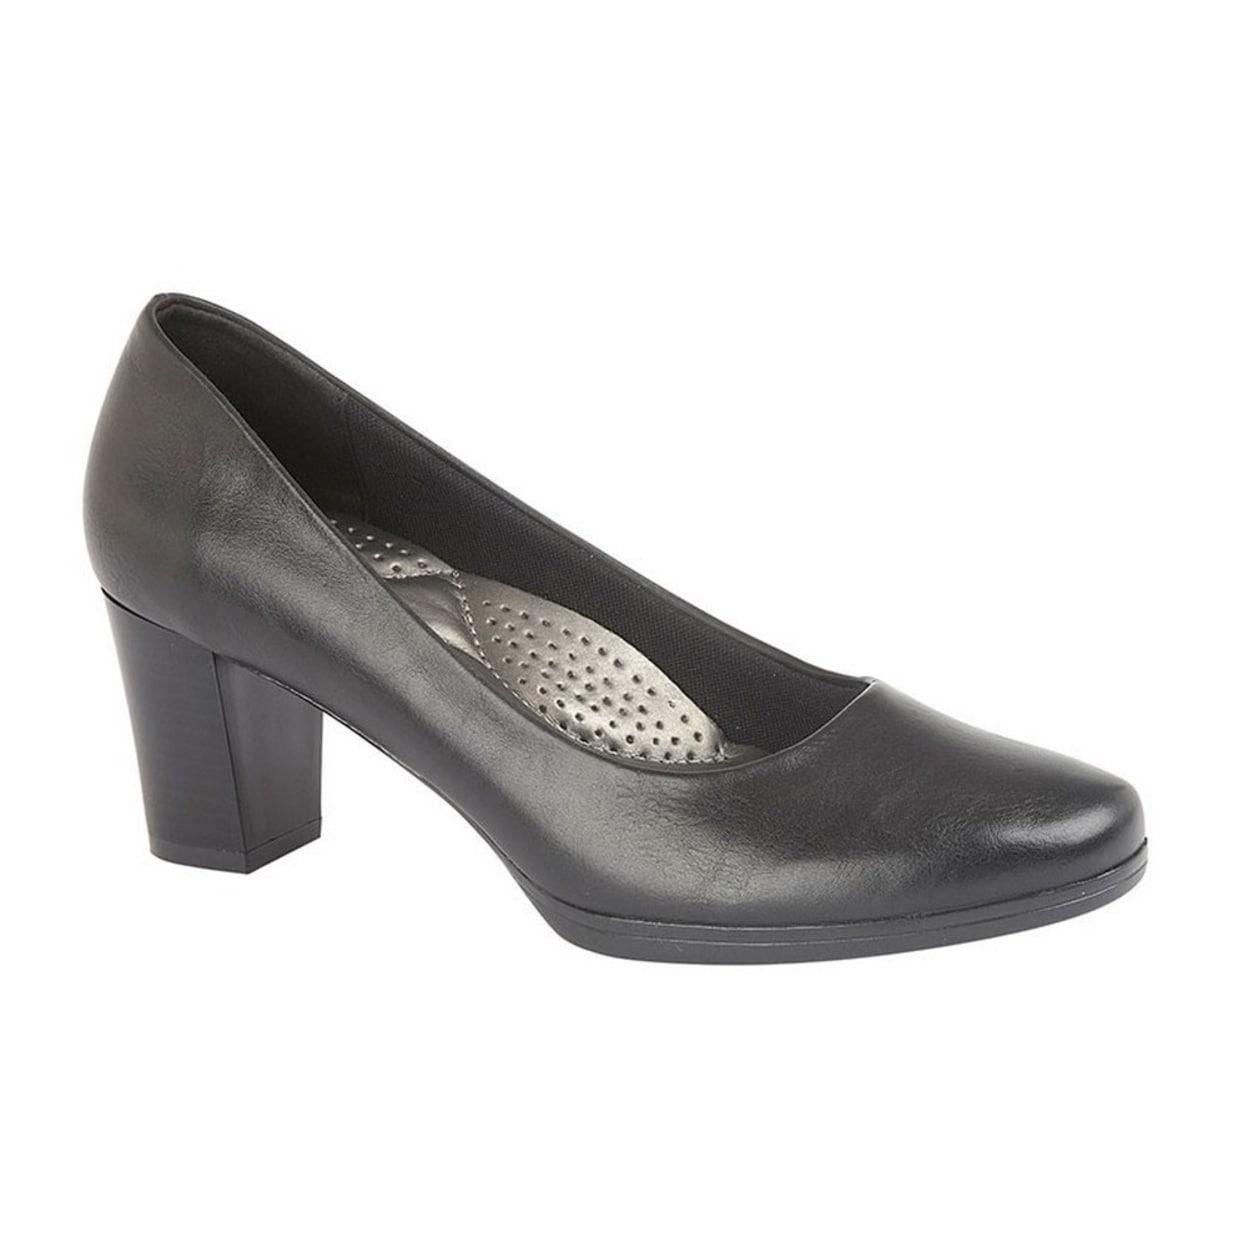 Shop Boulevard Womens/Ladies Pu Leather